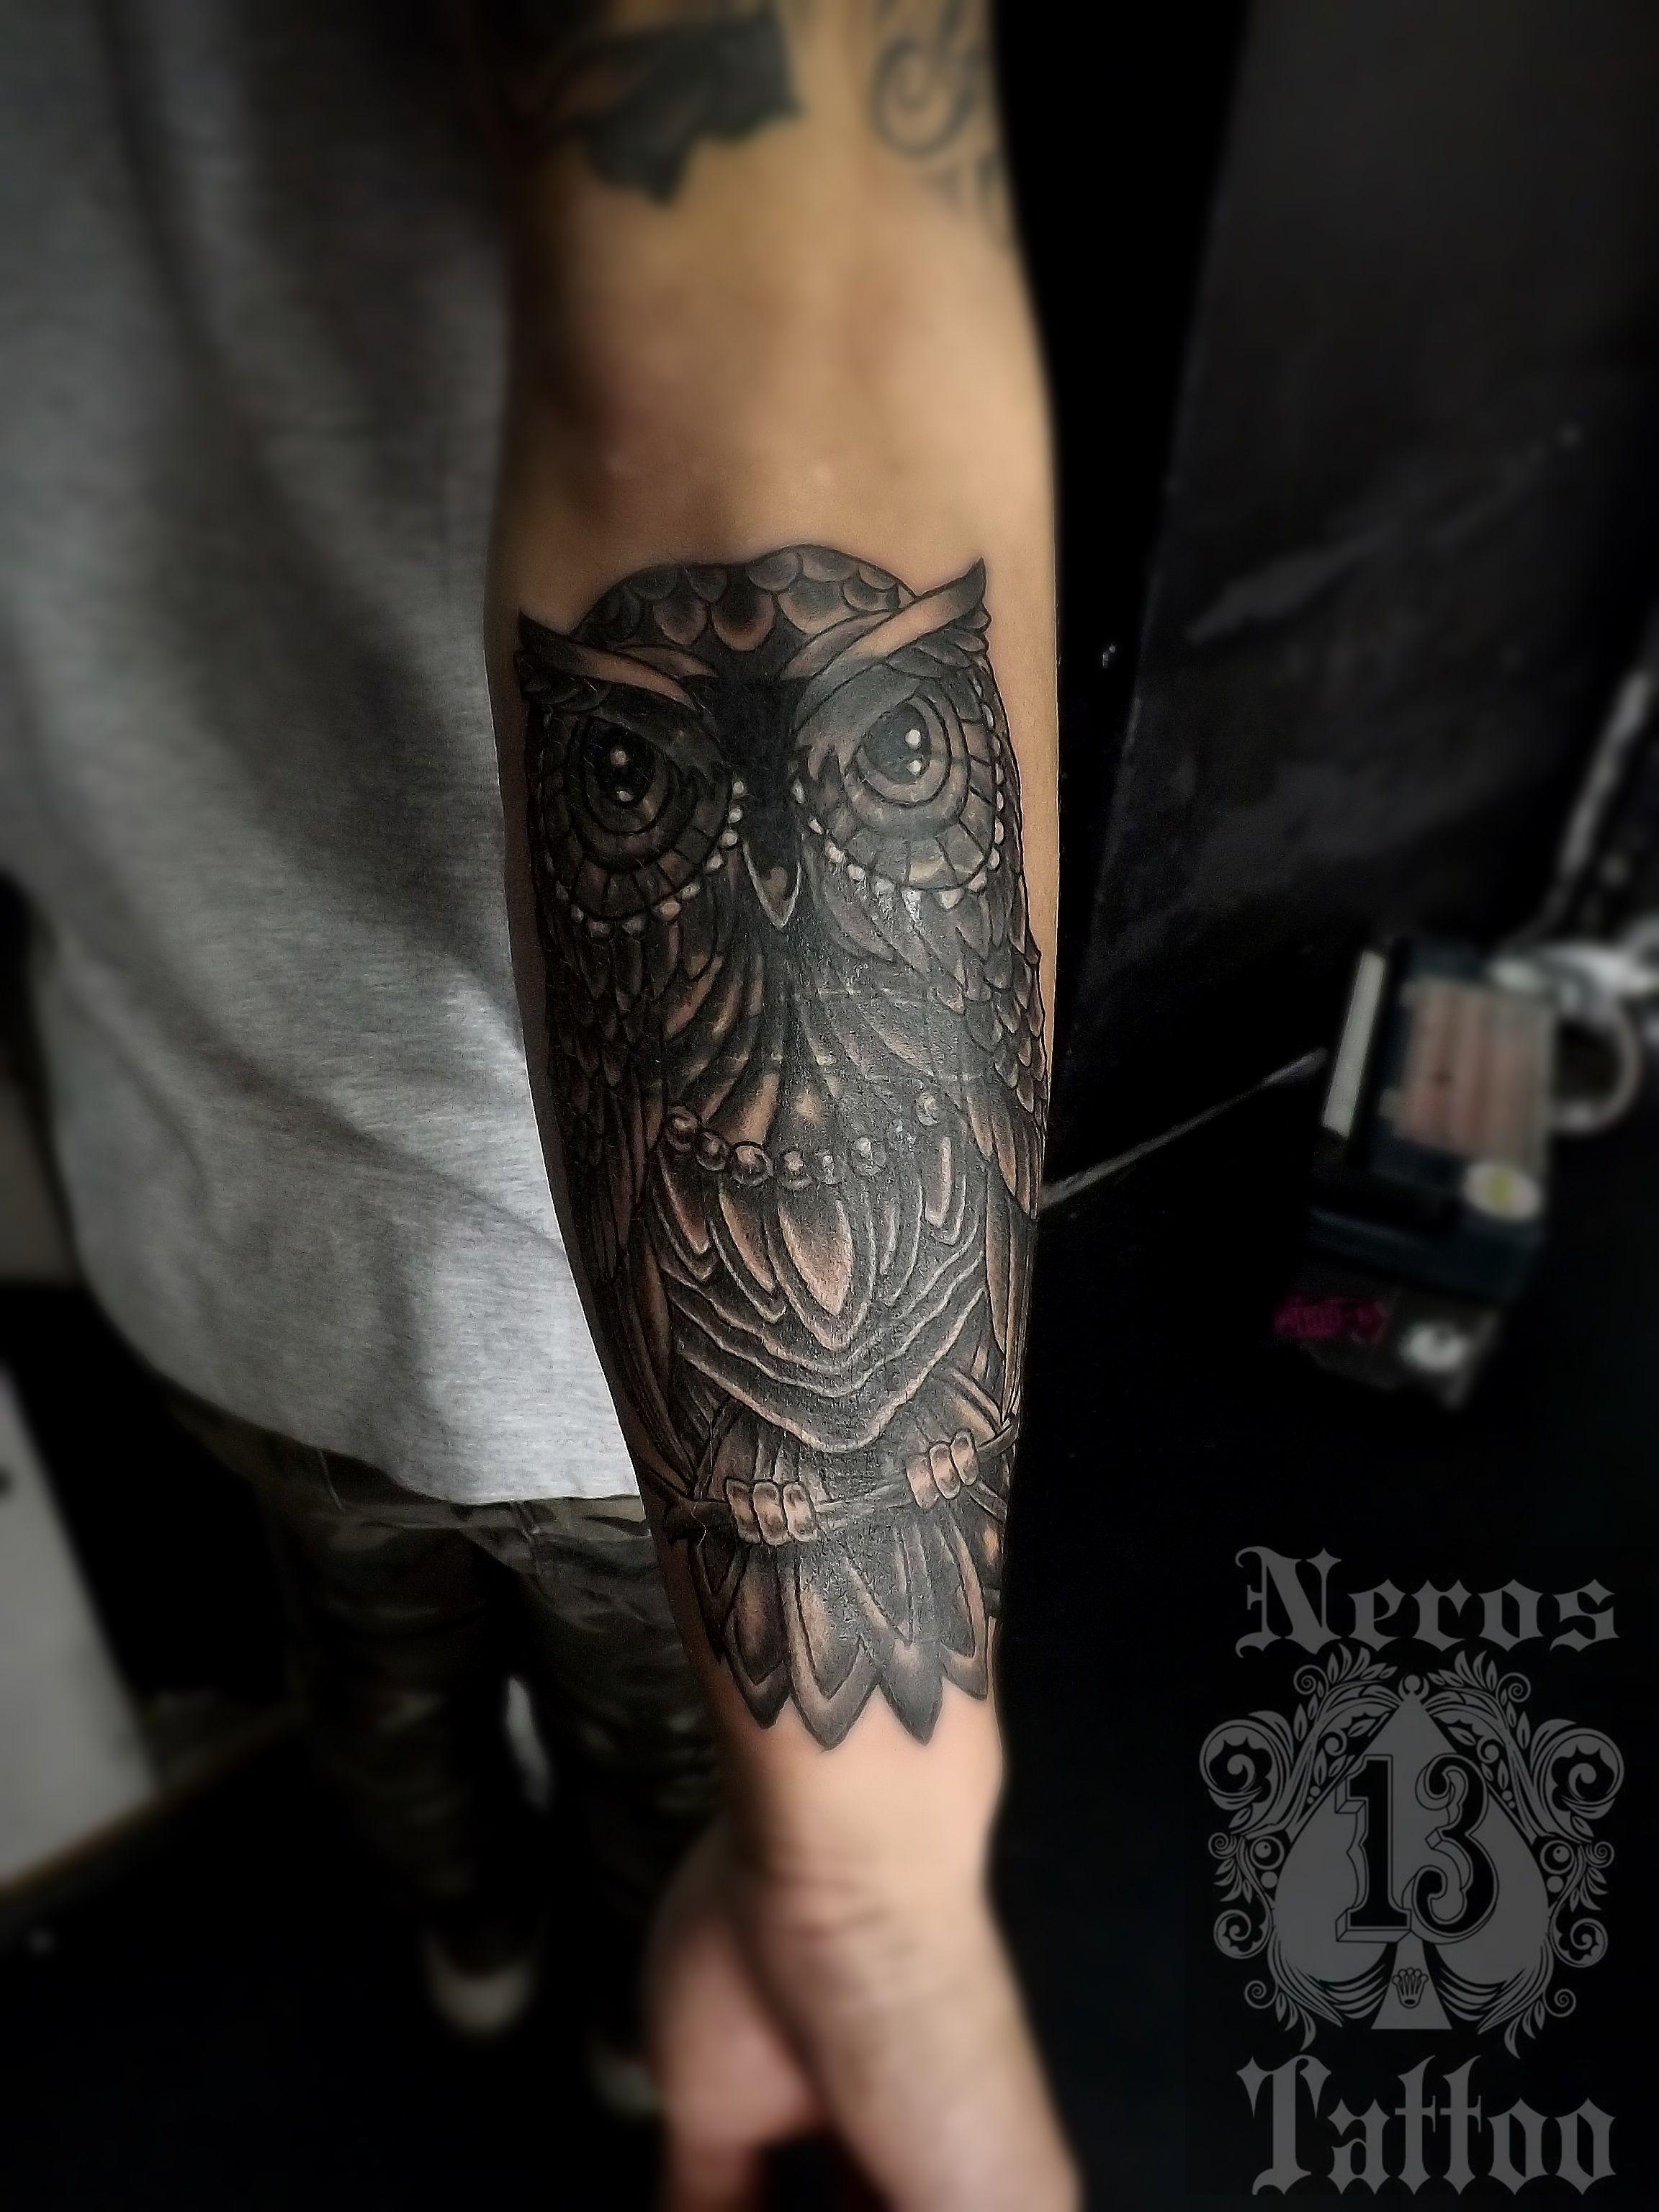 #covertattoo #owltattoo #tattoowl #tattoolife #luisdlarosa #nerostarroo #perutattoo